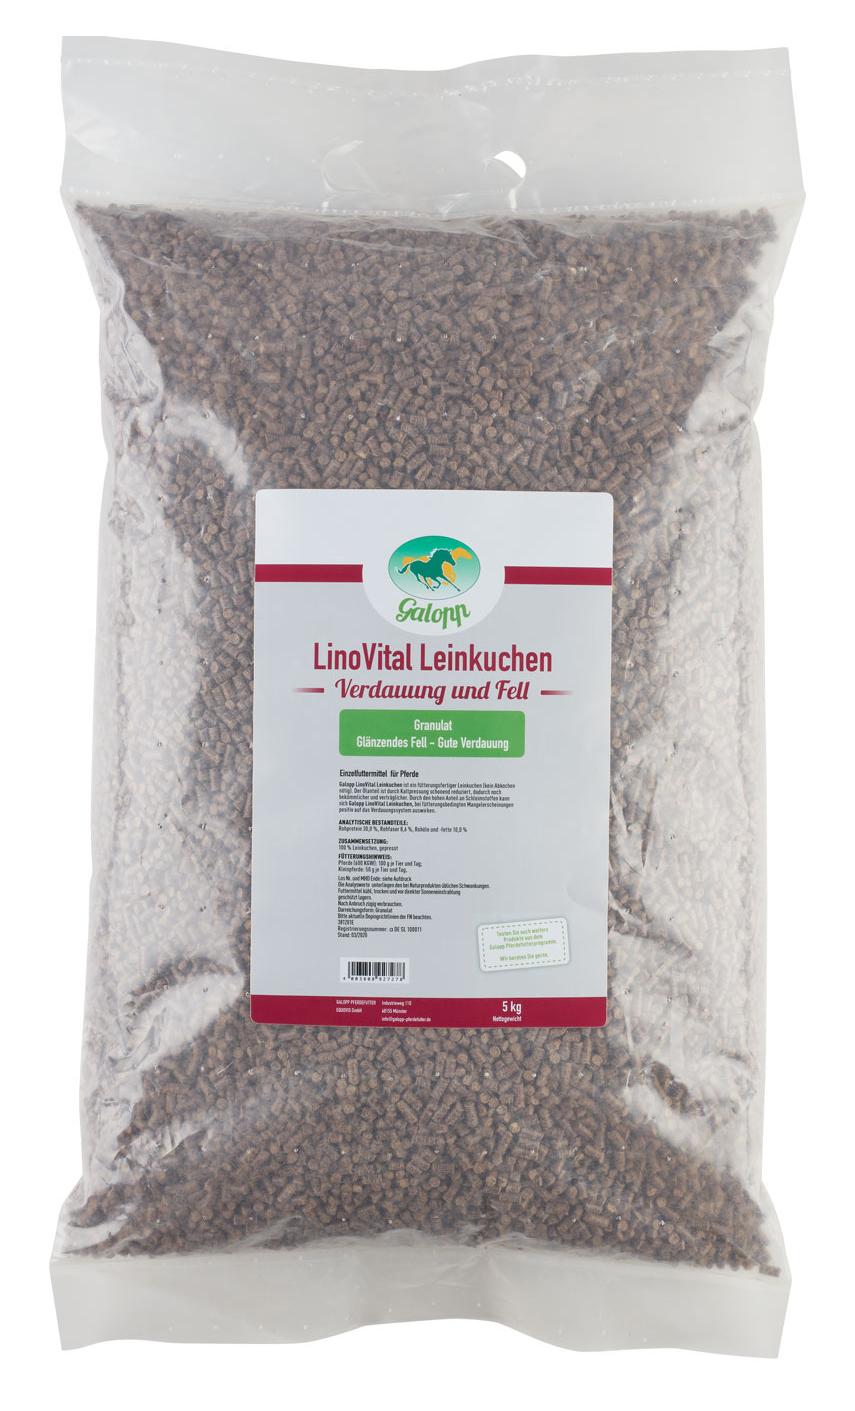 LinoVital Leinkuchen